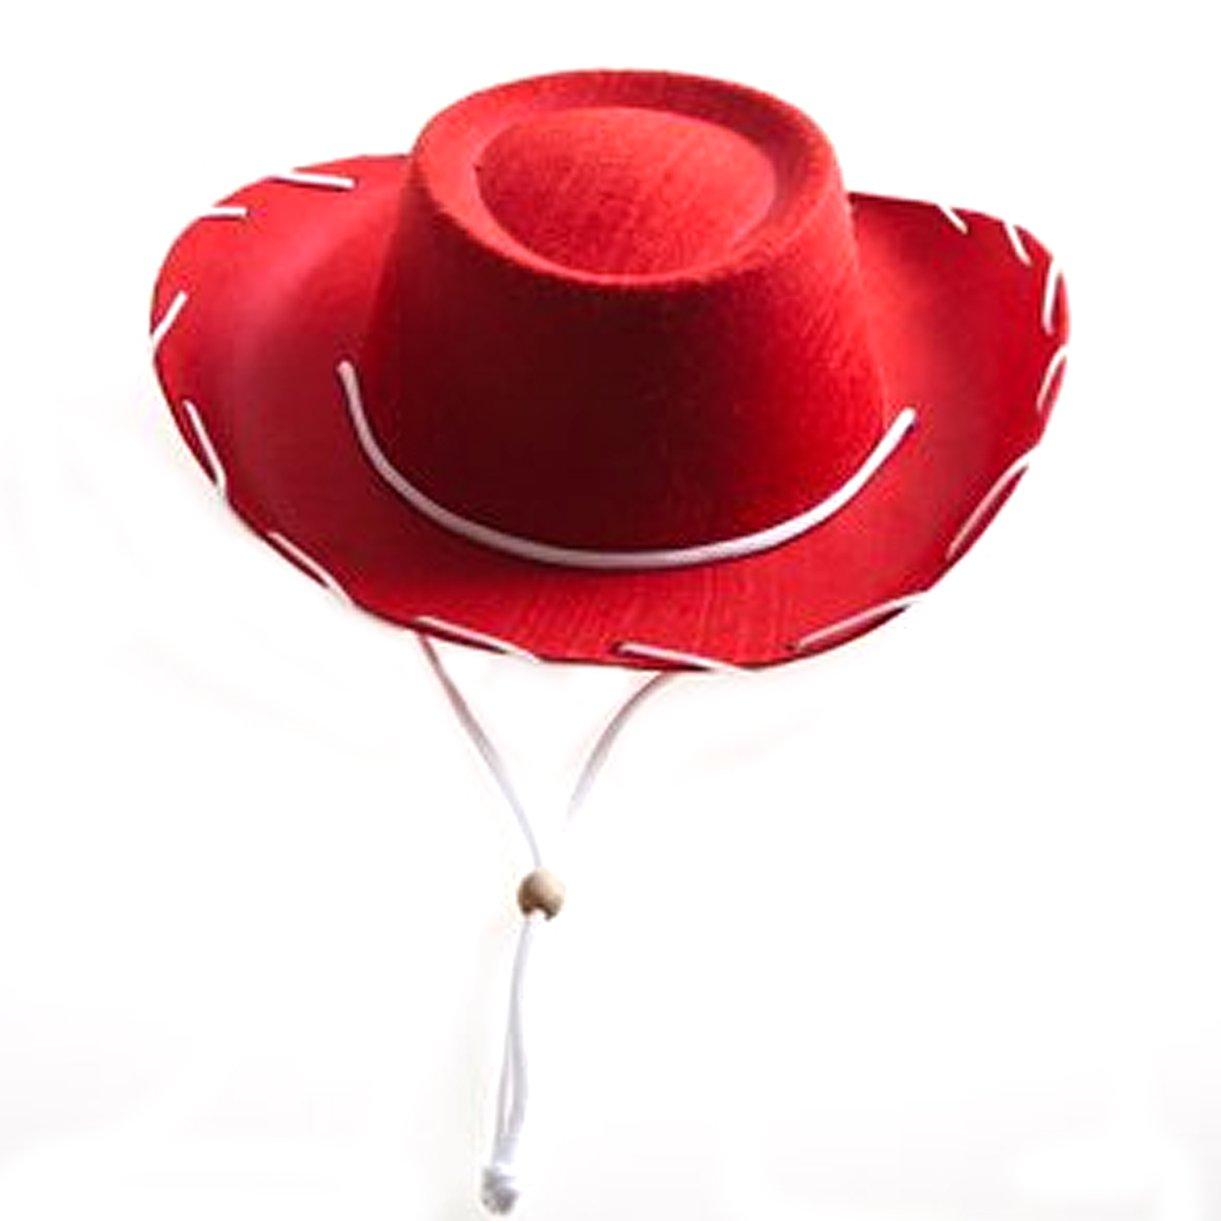 707b62e52 Century Novelty Children's Red Felt Cowboy Hat